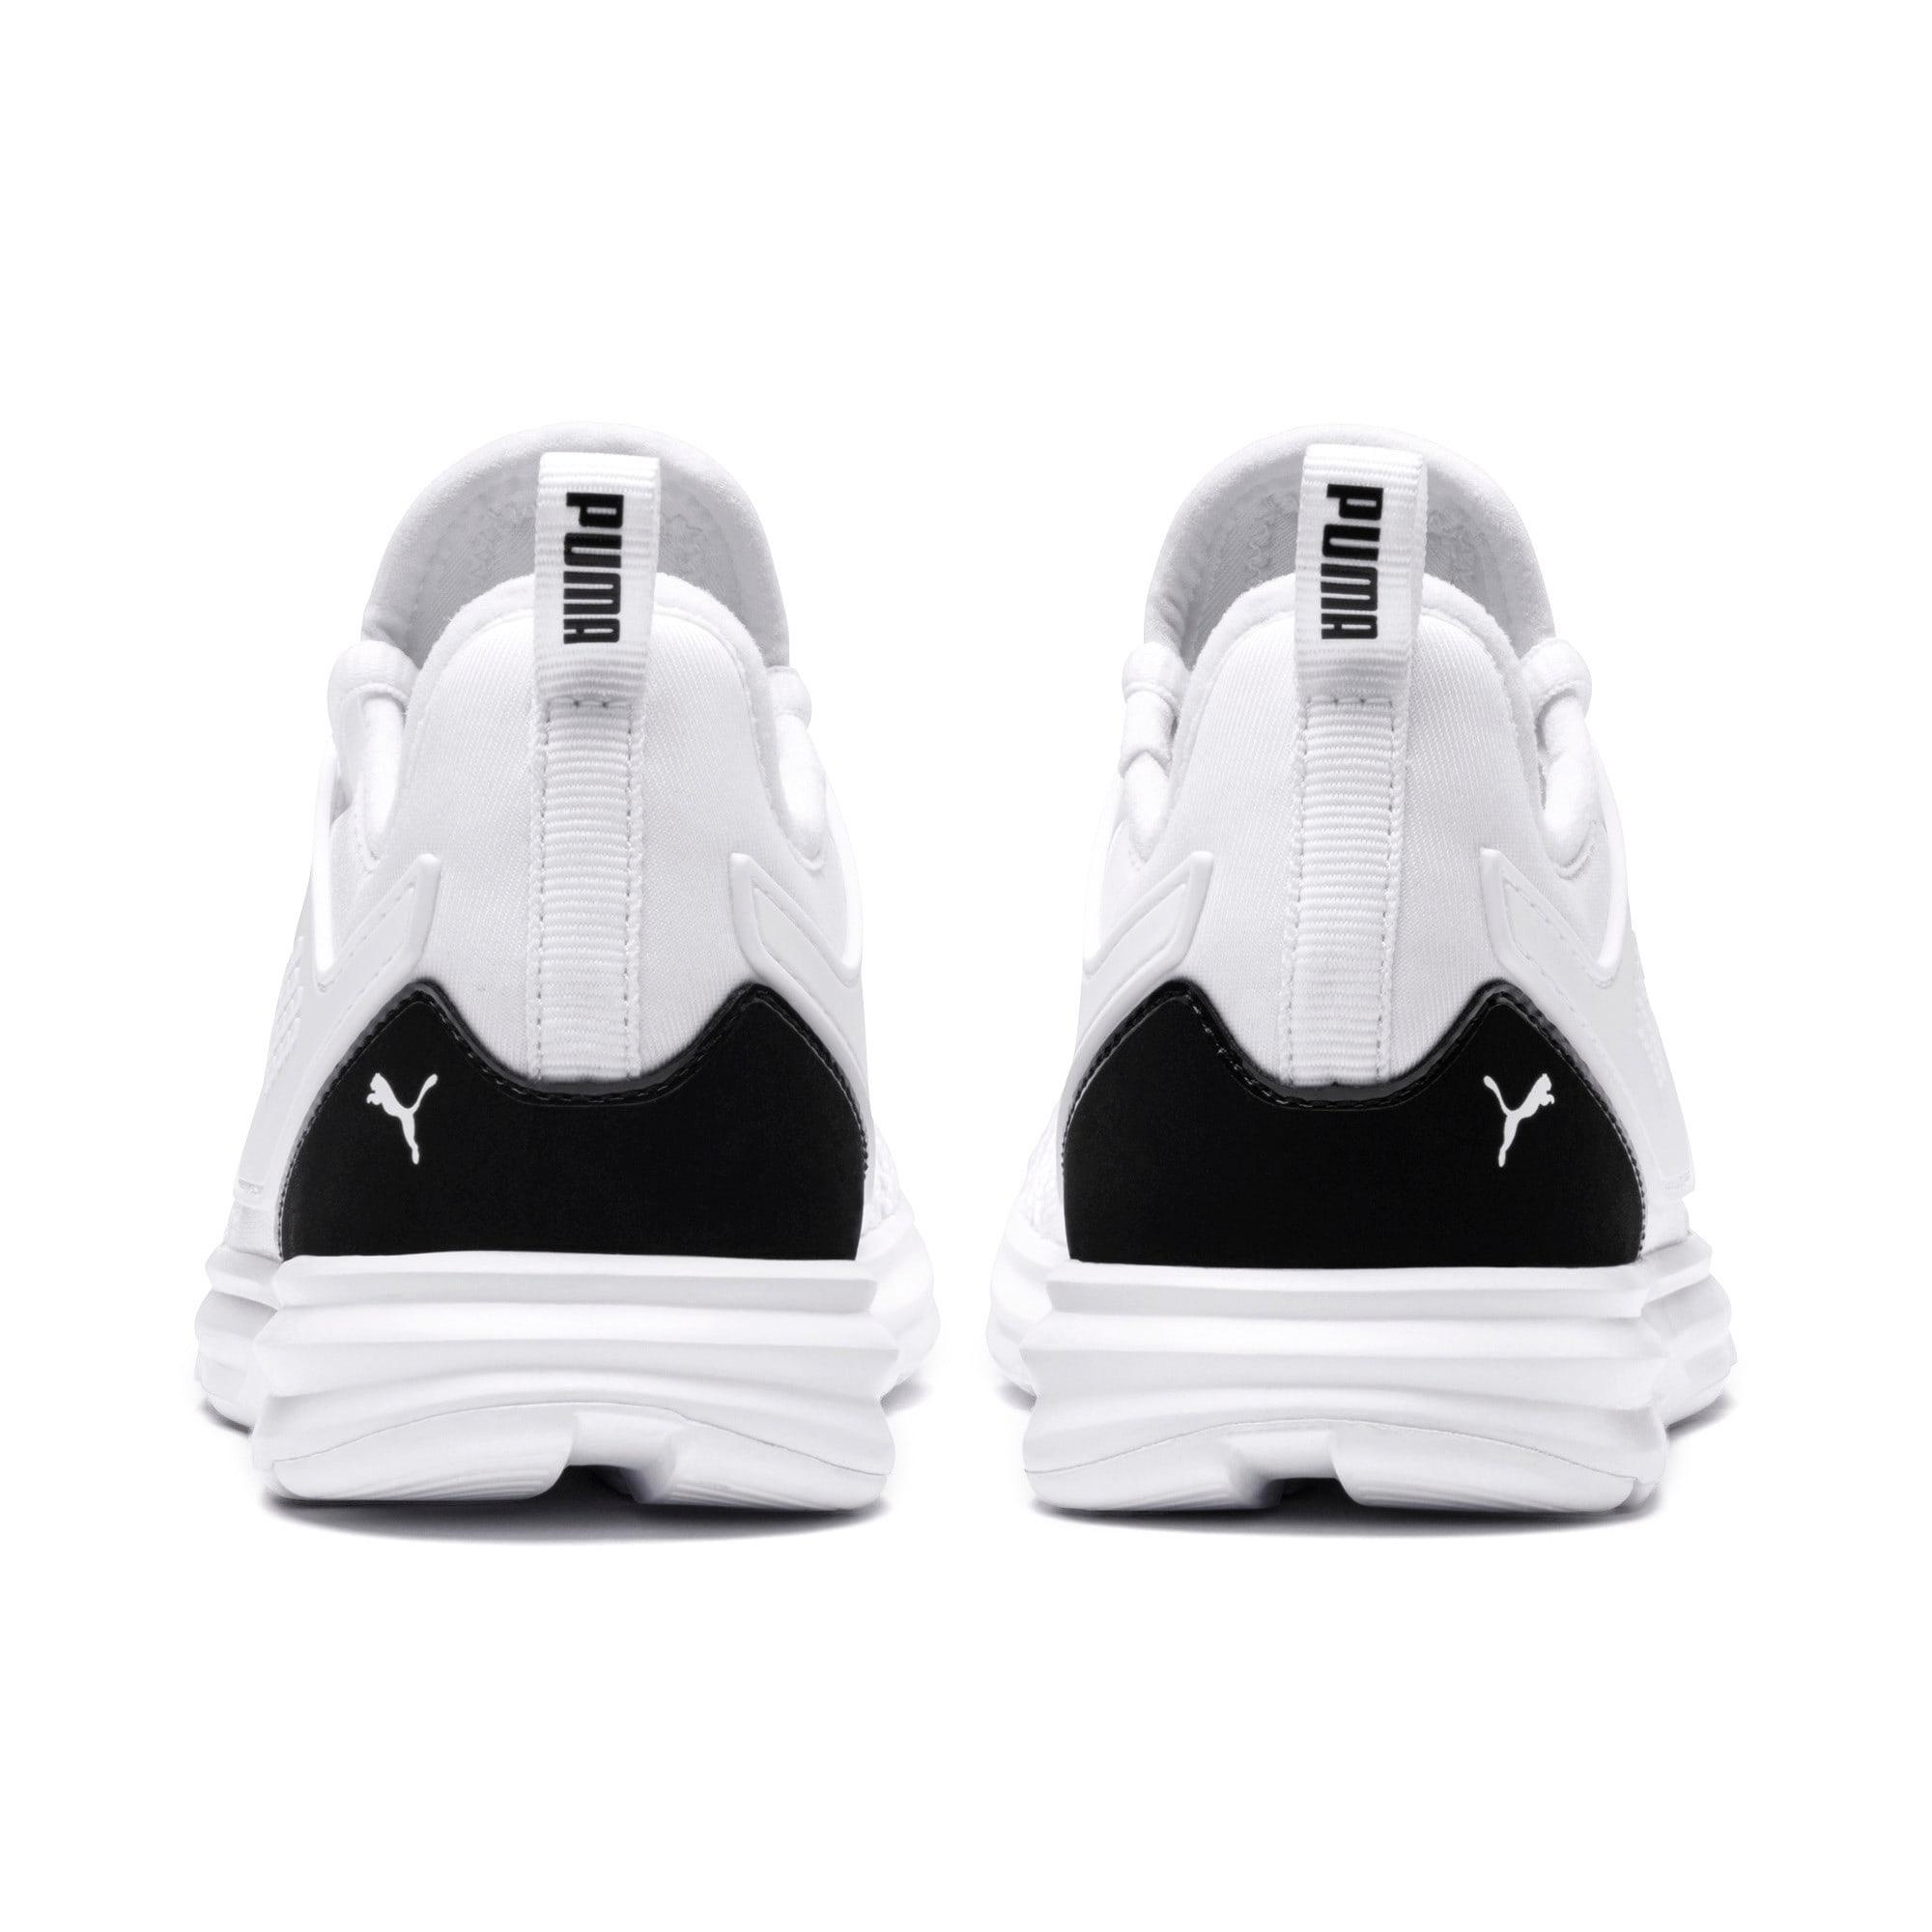 Thumbnail 4 of IGNITE Limitless 2 AC Little Kids' Little Kids' Shoes, Puma White-Puma Black, medium